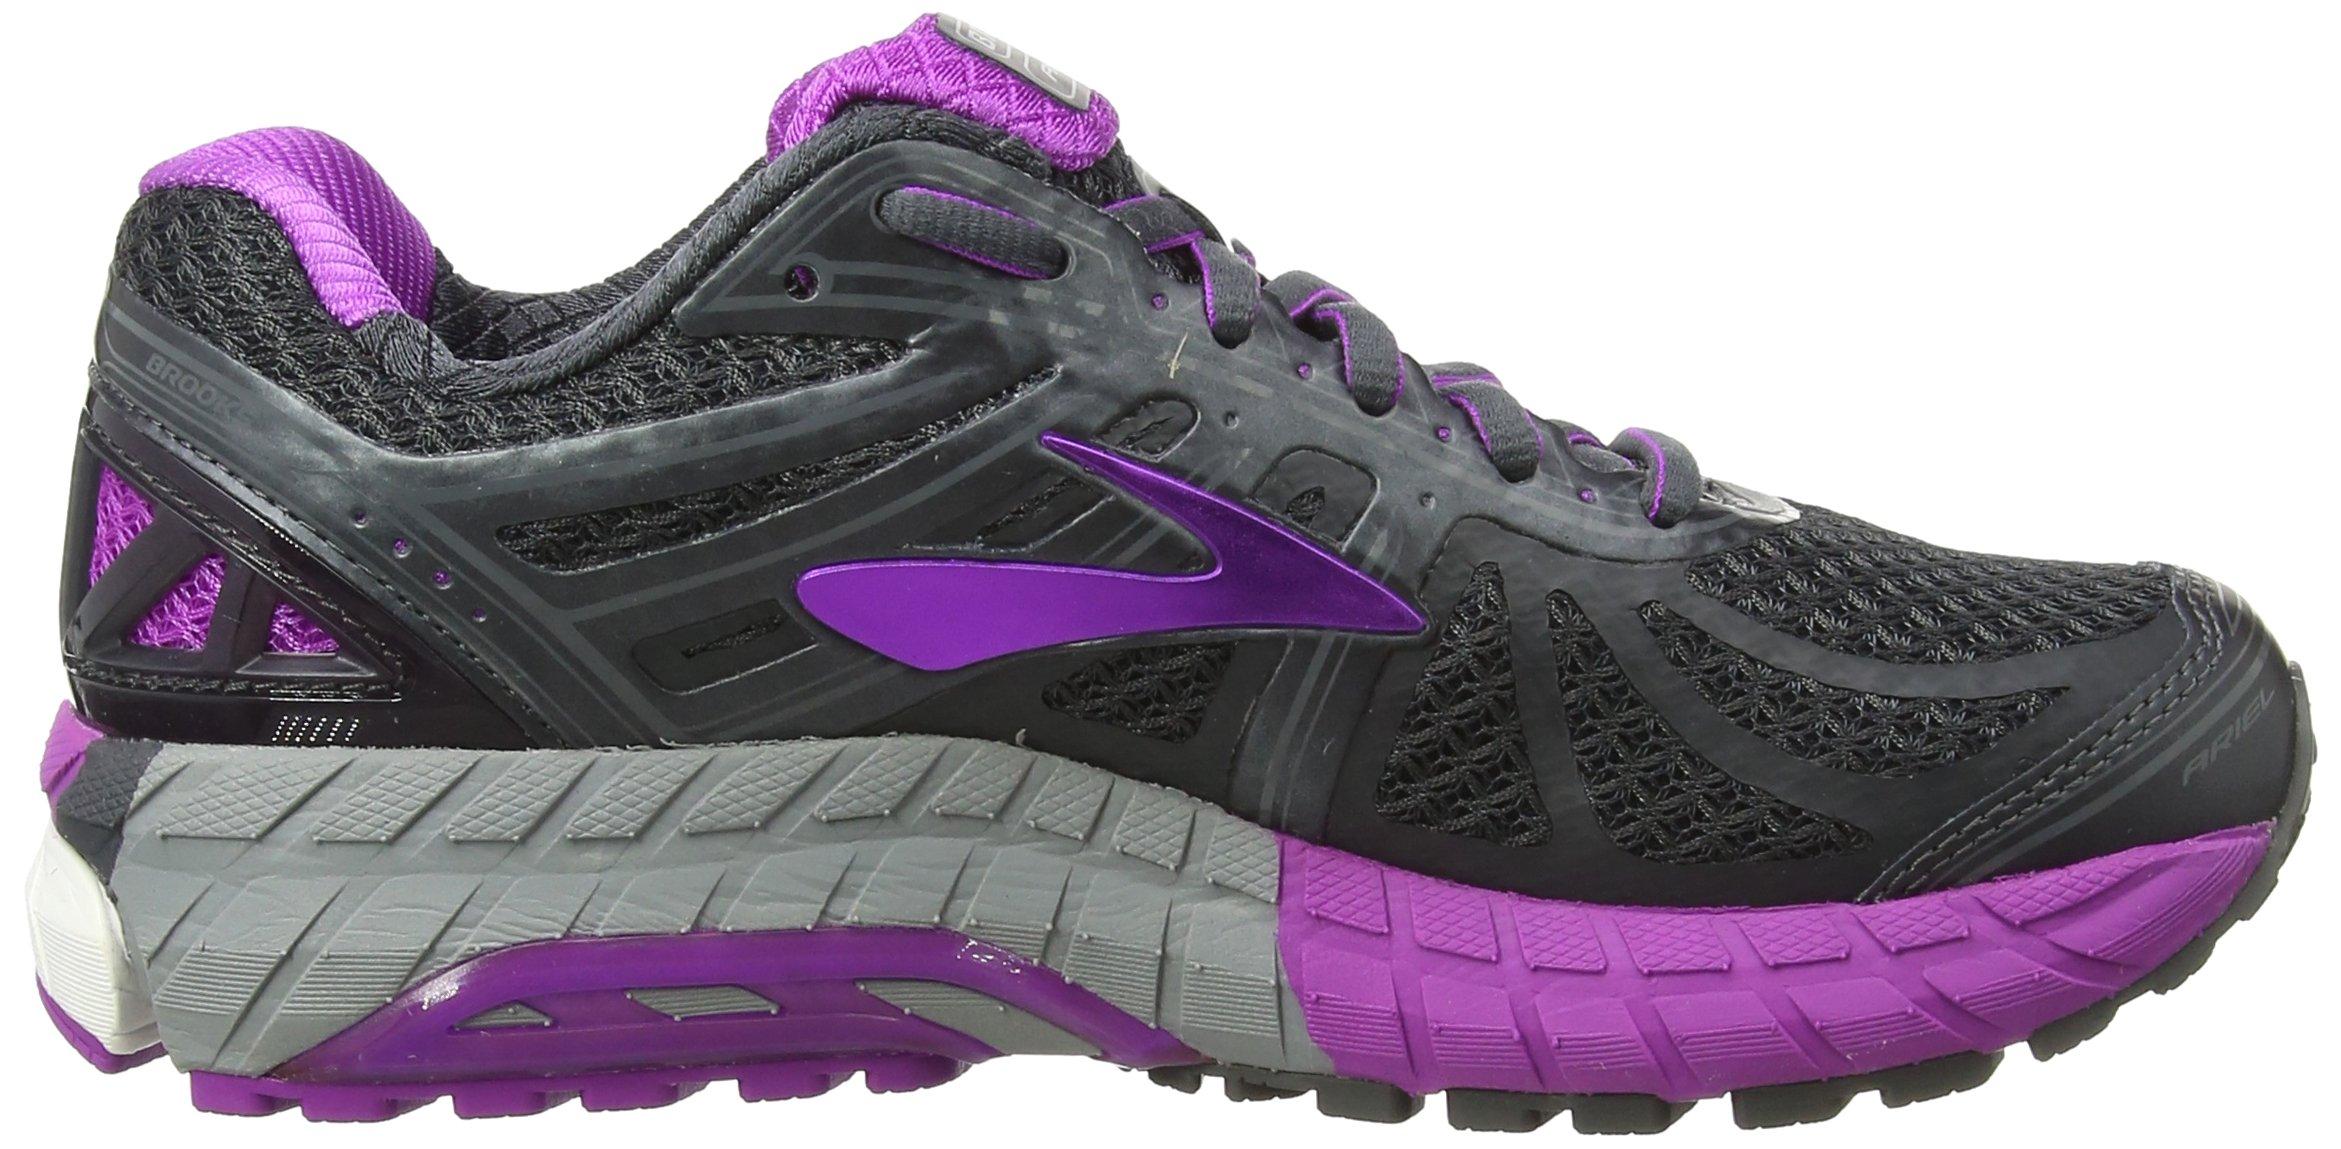 81UtBjkvitL - Brooks Women's Ariel '16 Running Shoes